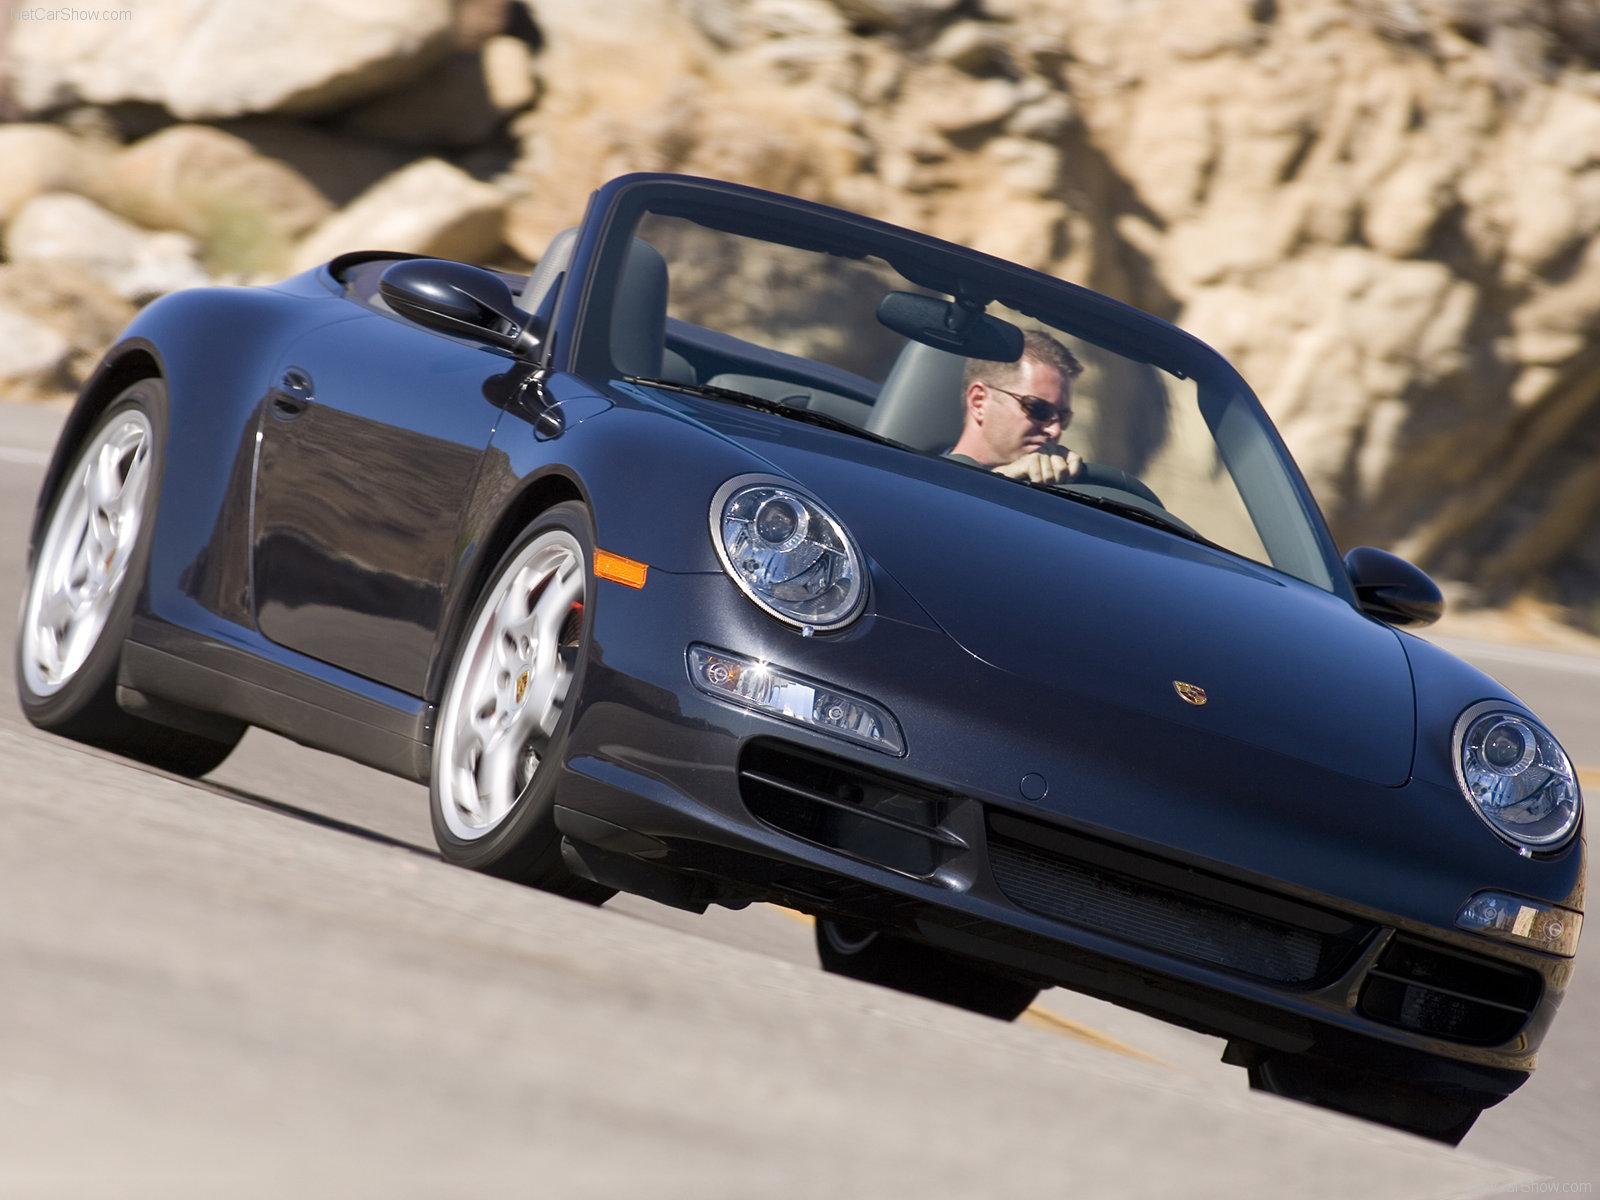 Porsche Cayenne Gts For Sale >> 2007 Black Porsche 911 Carrera 4S Cabriolet wallpapers